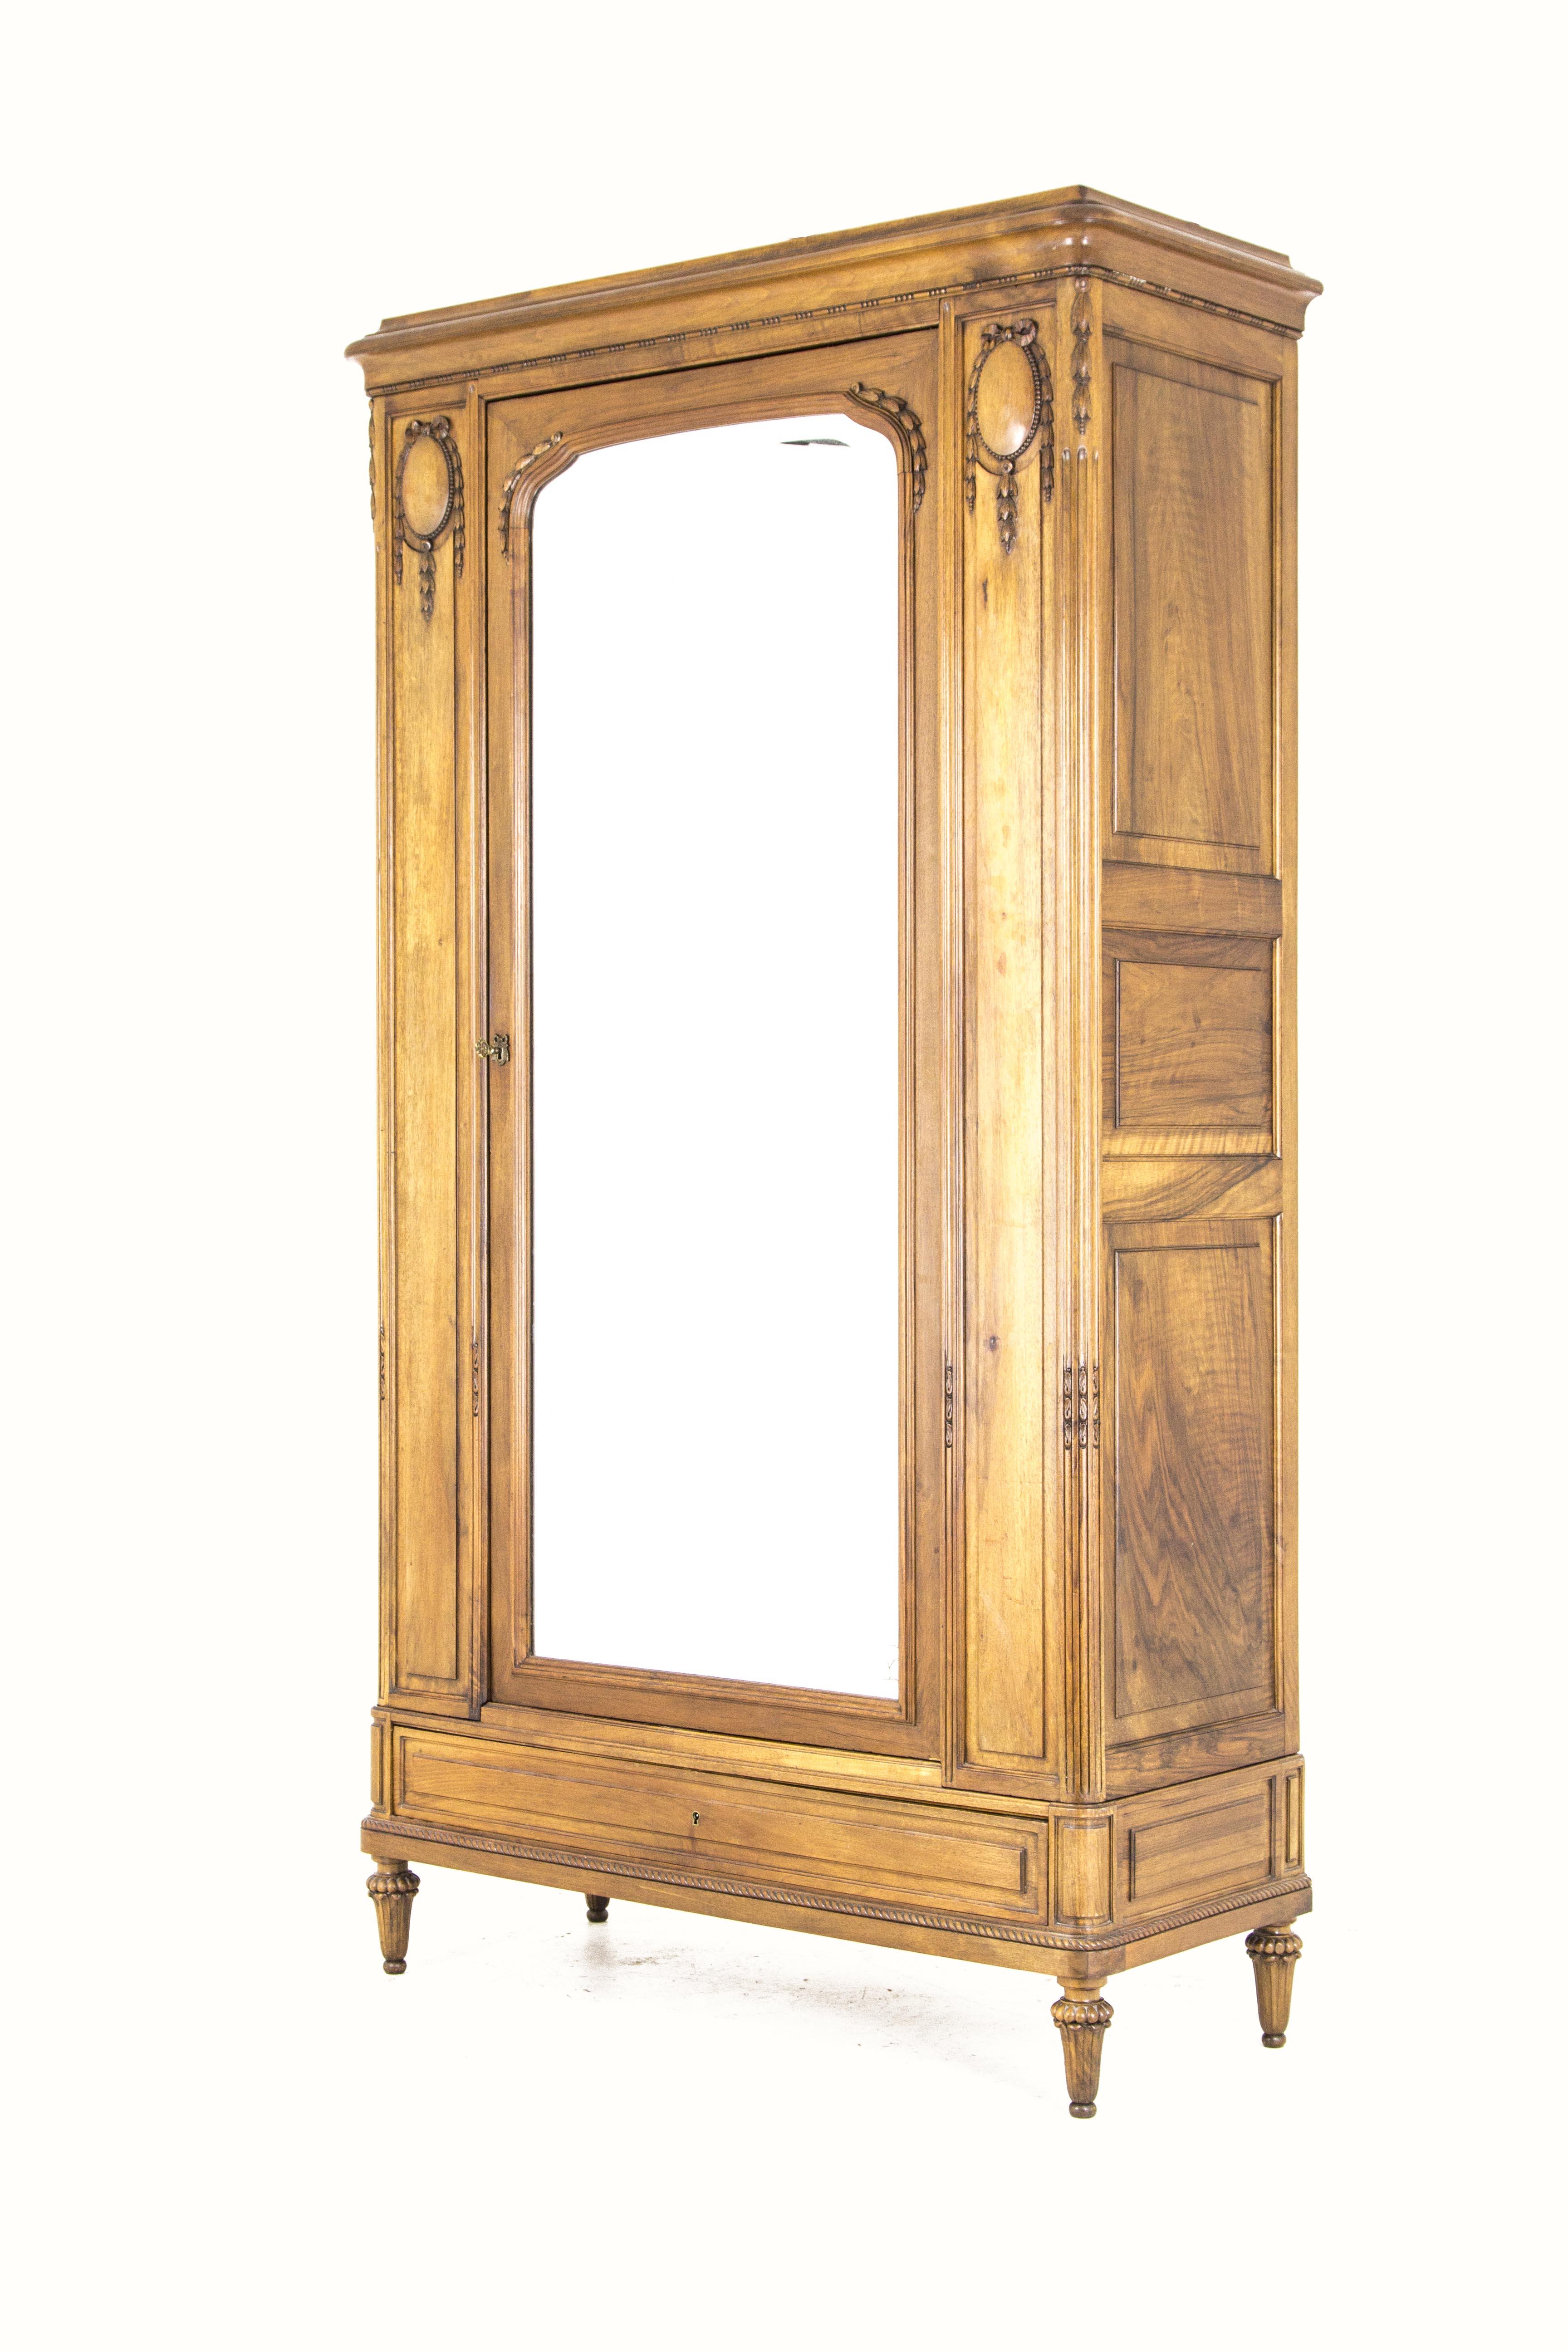 B626 Antique French Walnut Single Door Armoire Wardrobe